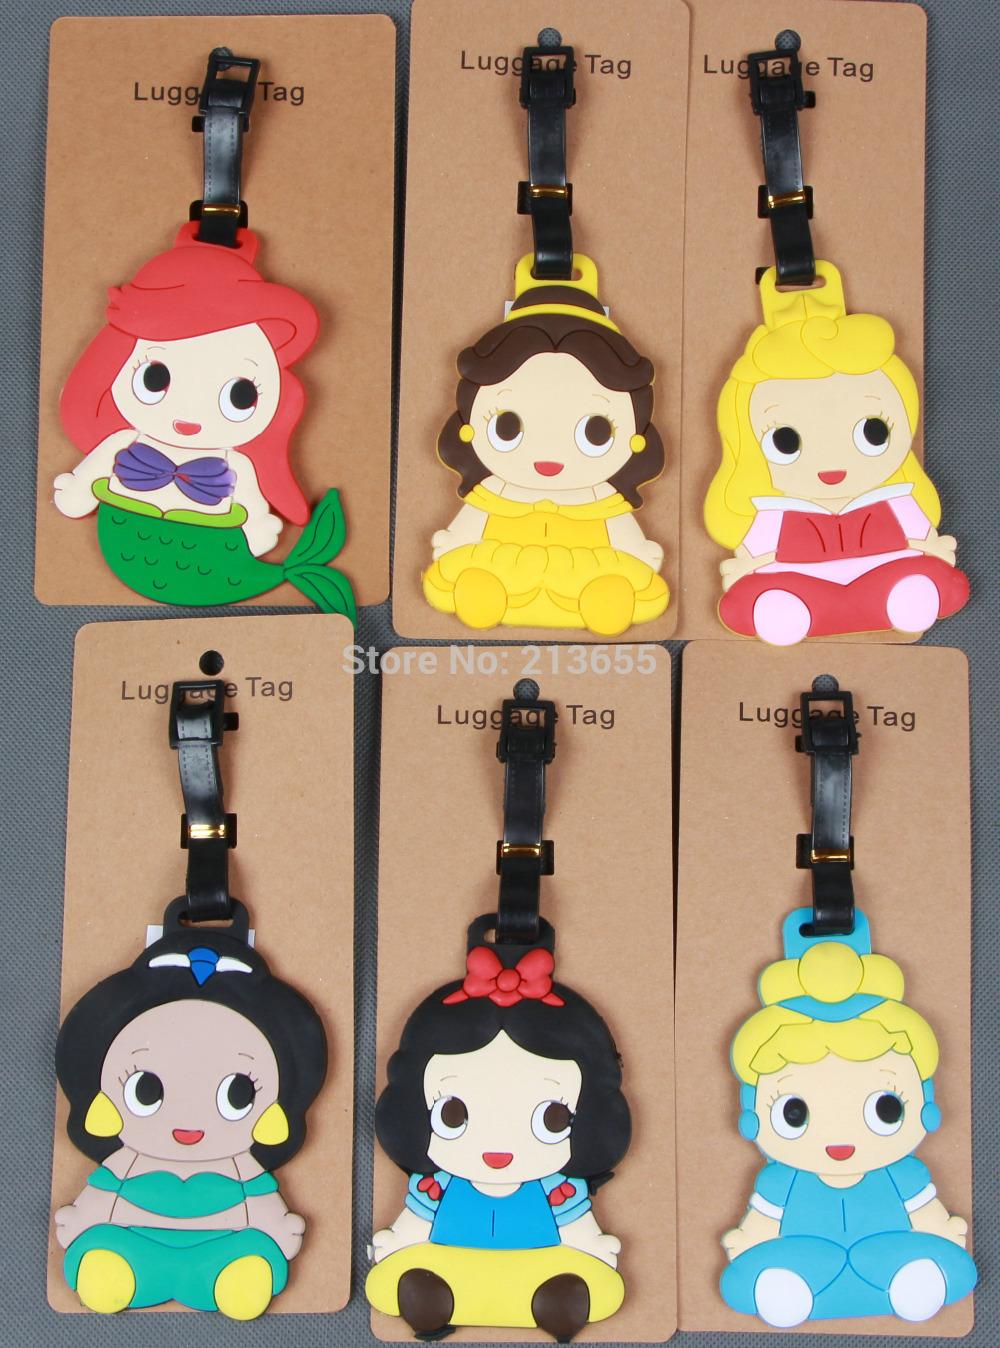 Free shipping 1pcs new arriving popular luggage tags Princess Snow White Aurora Mermaid suitcase bag tag(China (Mainland))